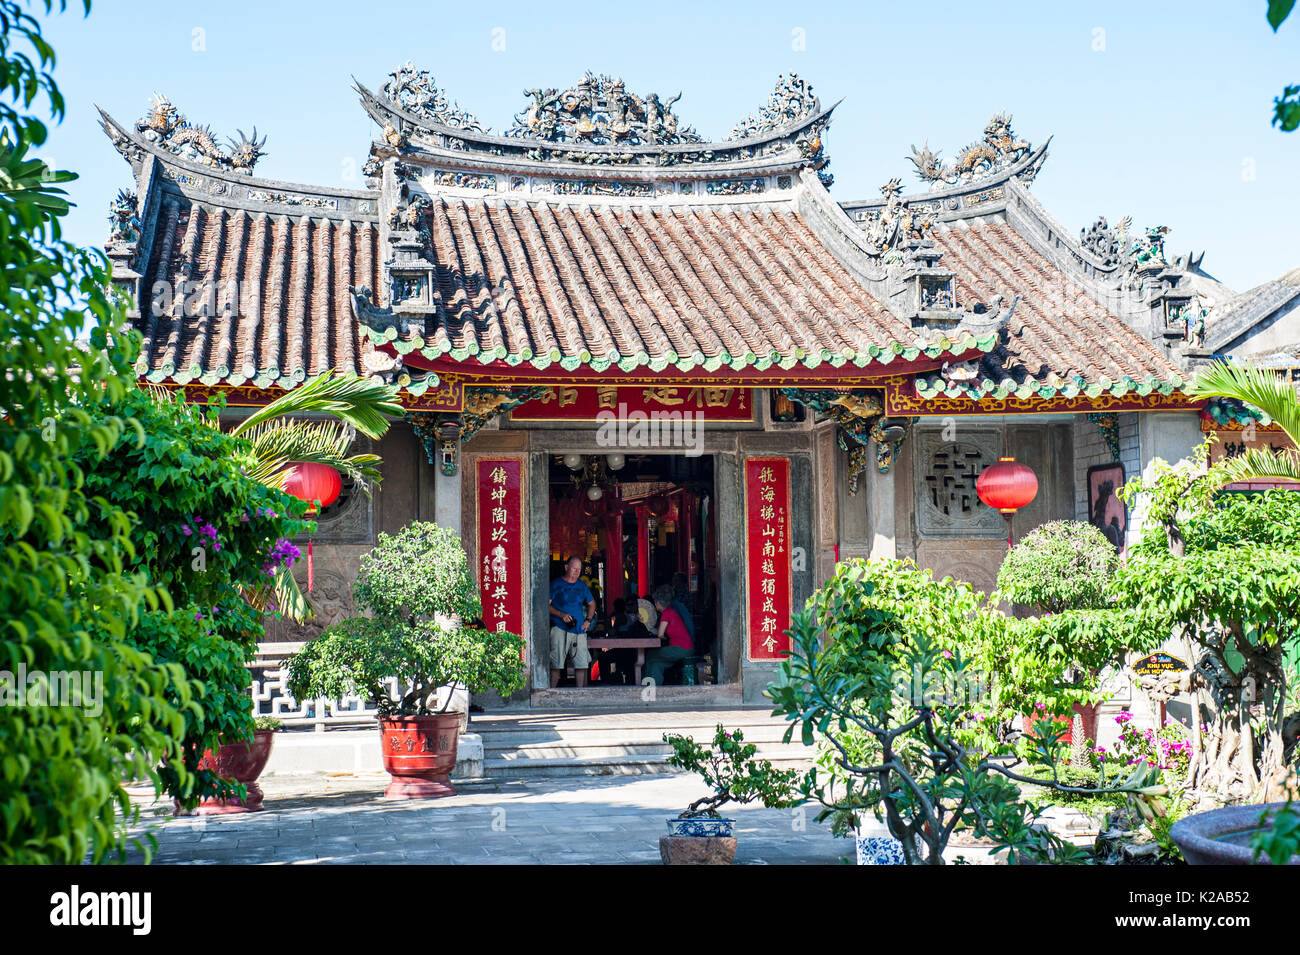 Fukien Congregazione cinese Assembly Hall, Phuoc Kien Hoi Quan, antica città di Hoi An, Vietnam Foto Stock